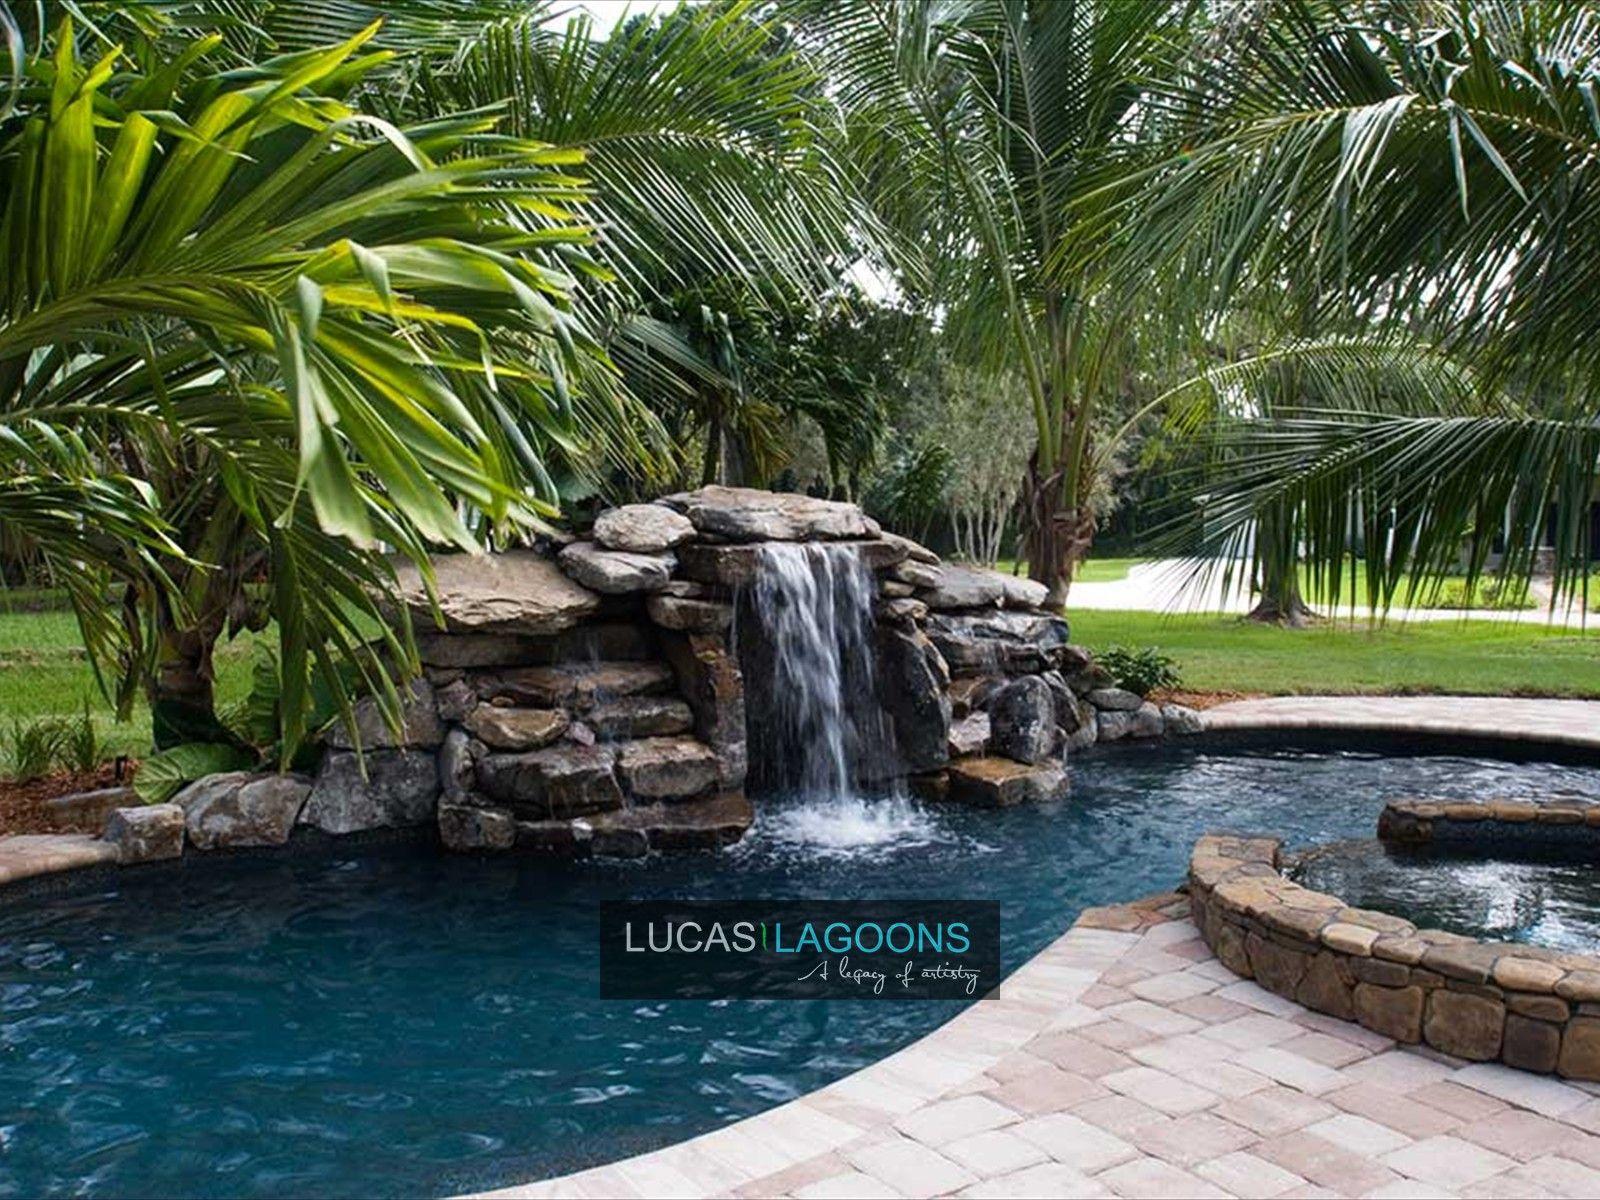 Lucas Lagoons Lagoon Pool Lucas Lagoons Pools Pool